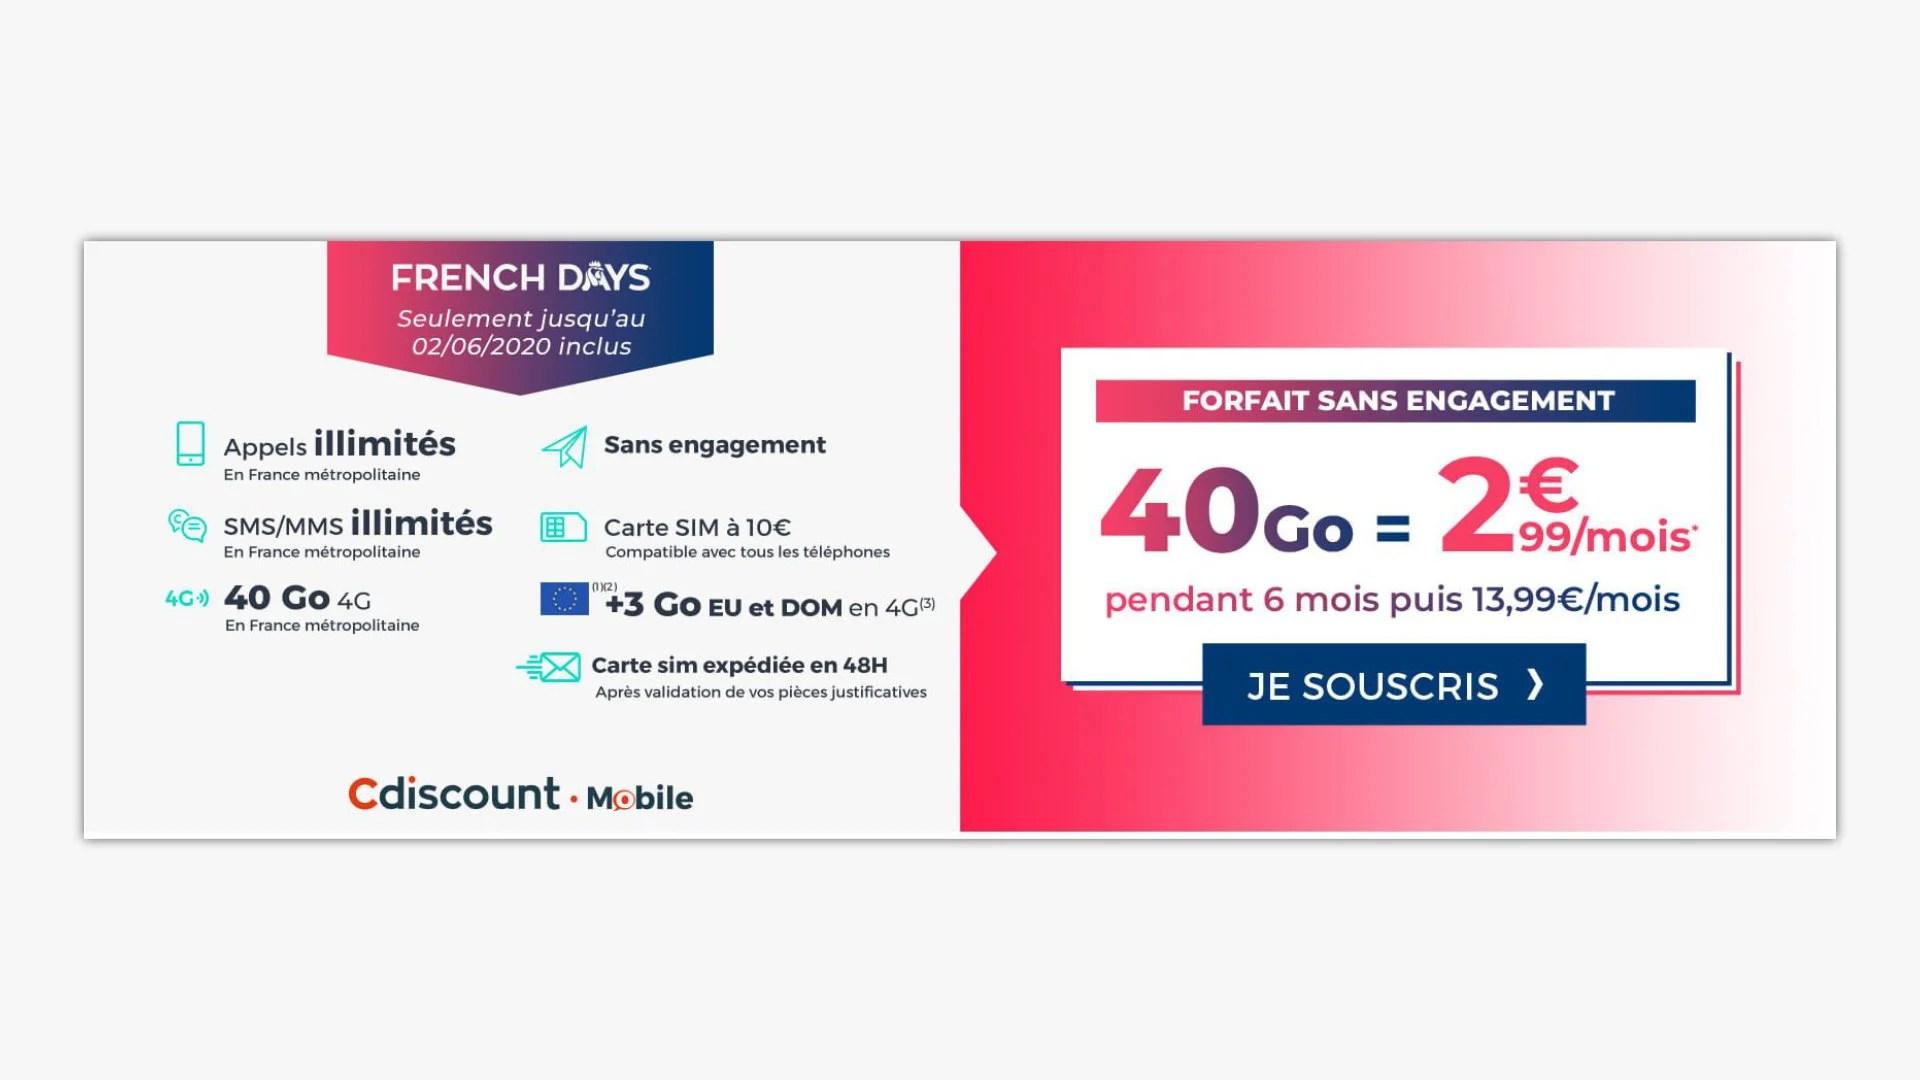 French Days : ce forfait mobile 40 Go passe à 2,99 euros/mois seulement